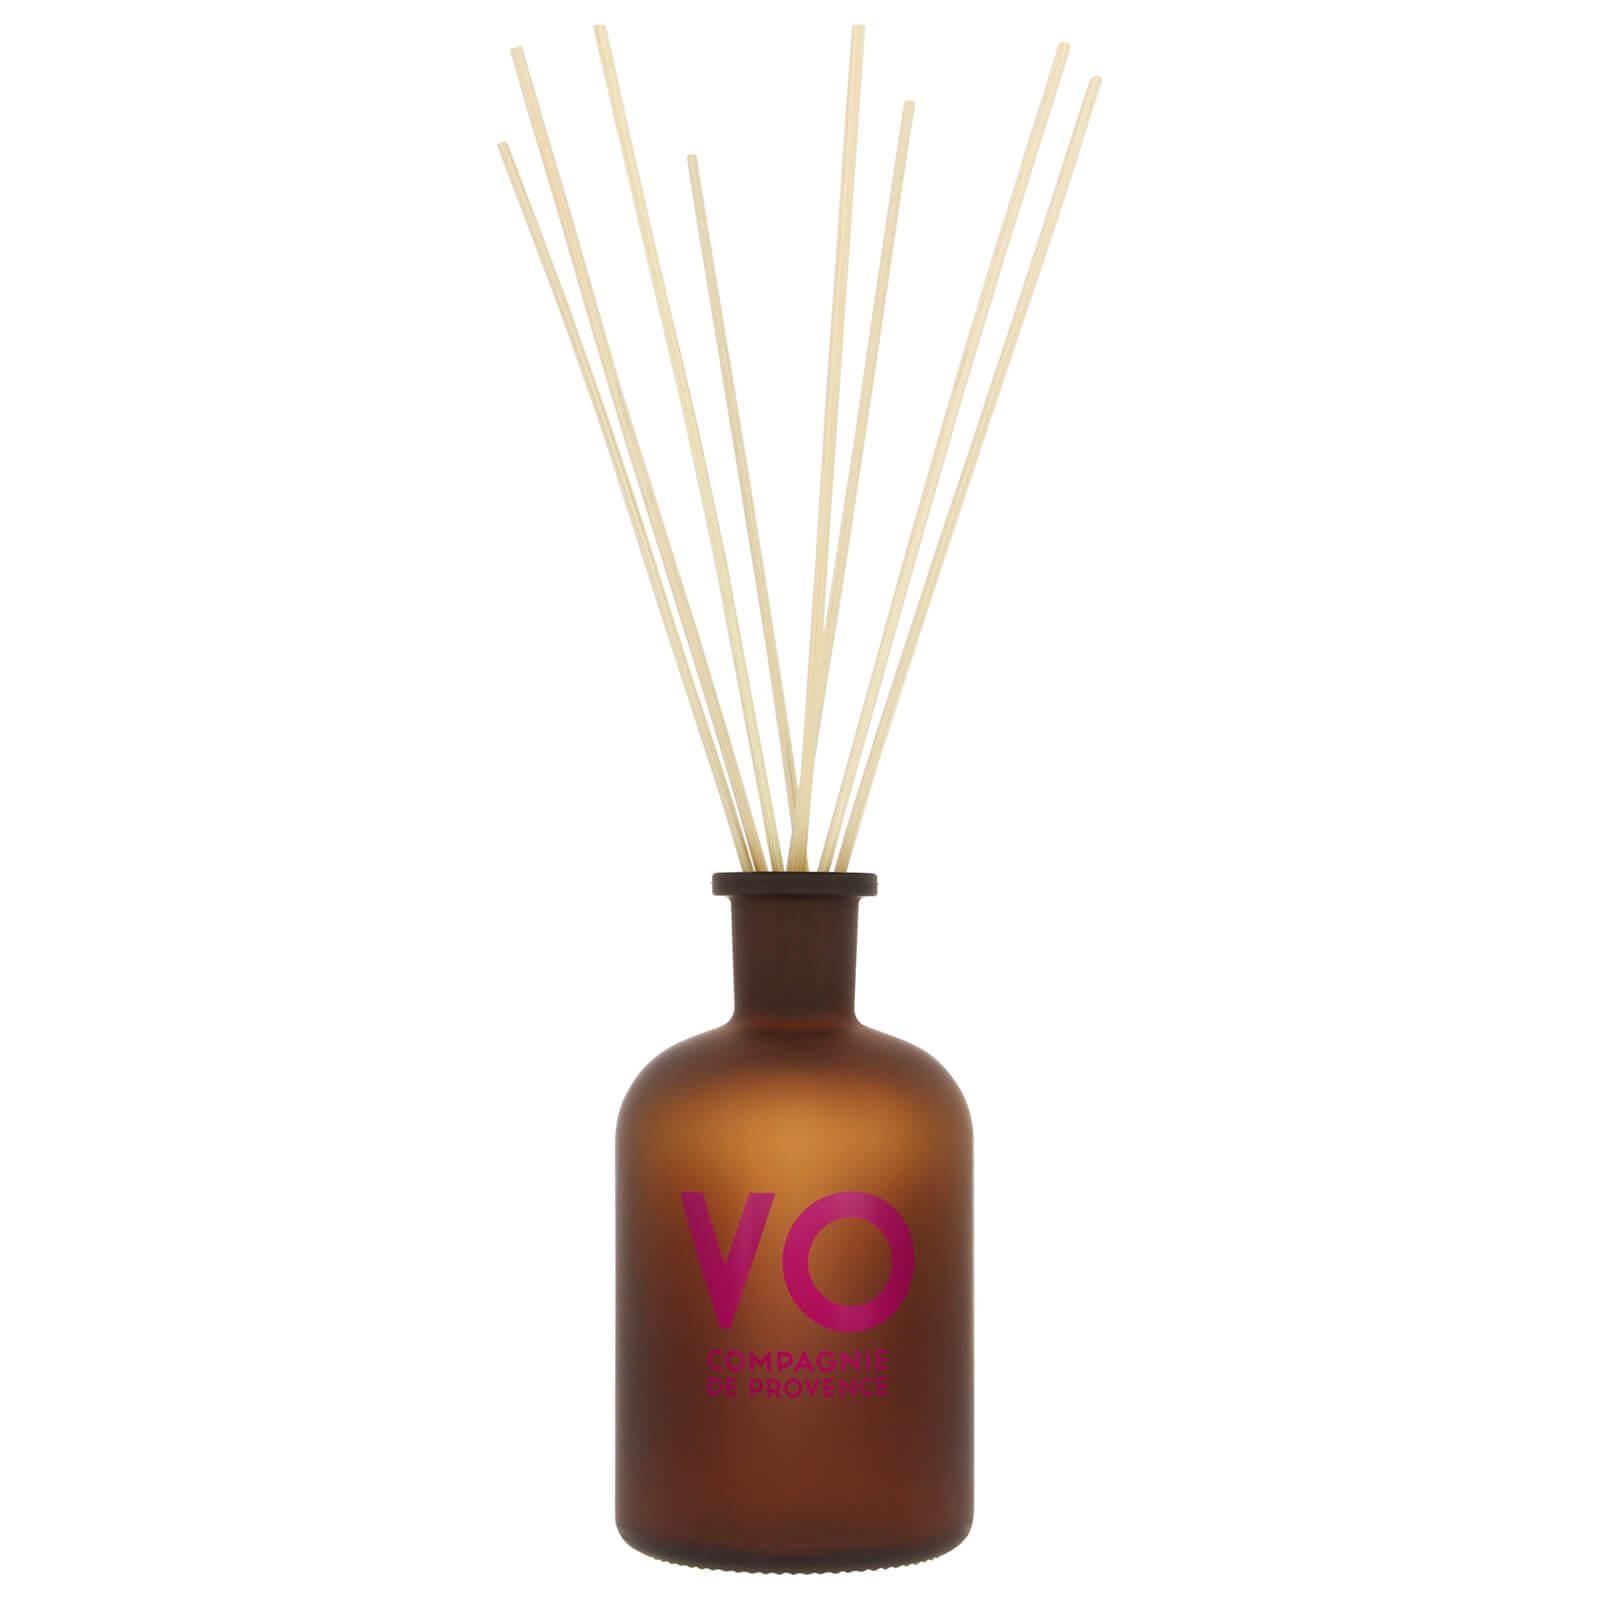 Compagnie de Provence Cistus Cardamom Fragrance Diffuser 300ml